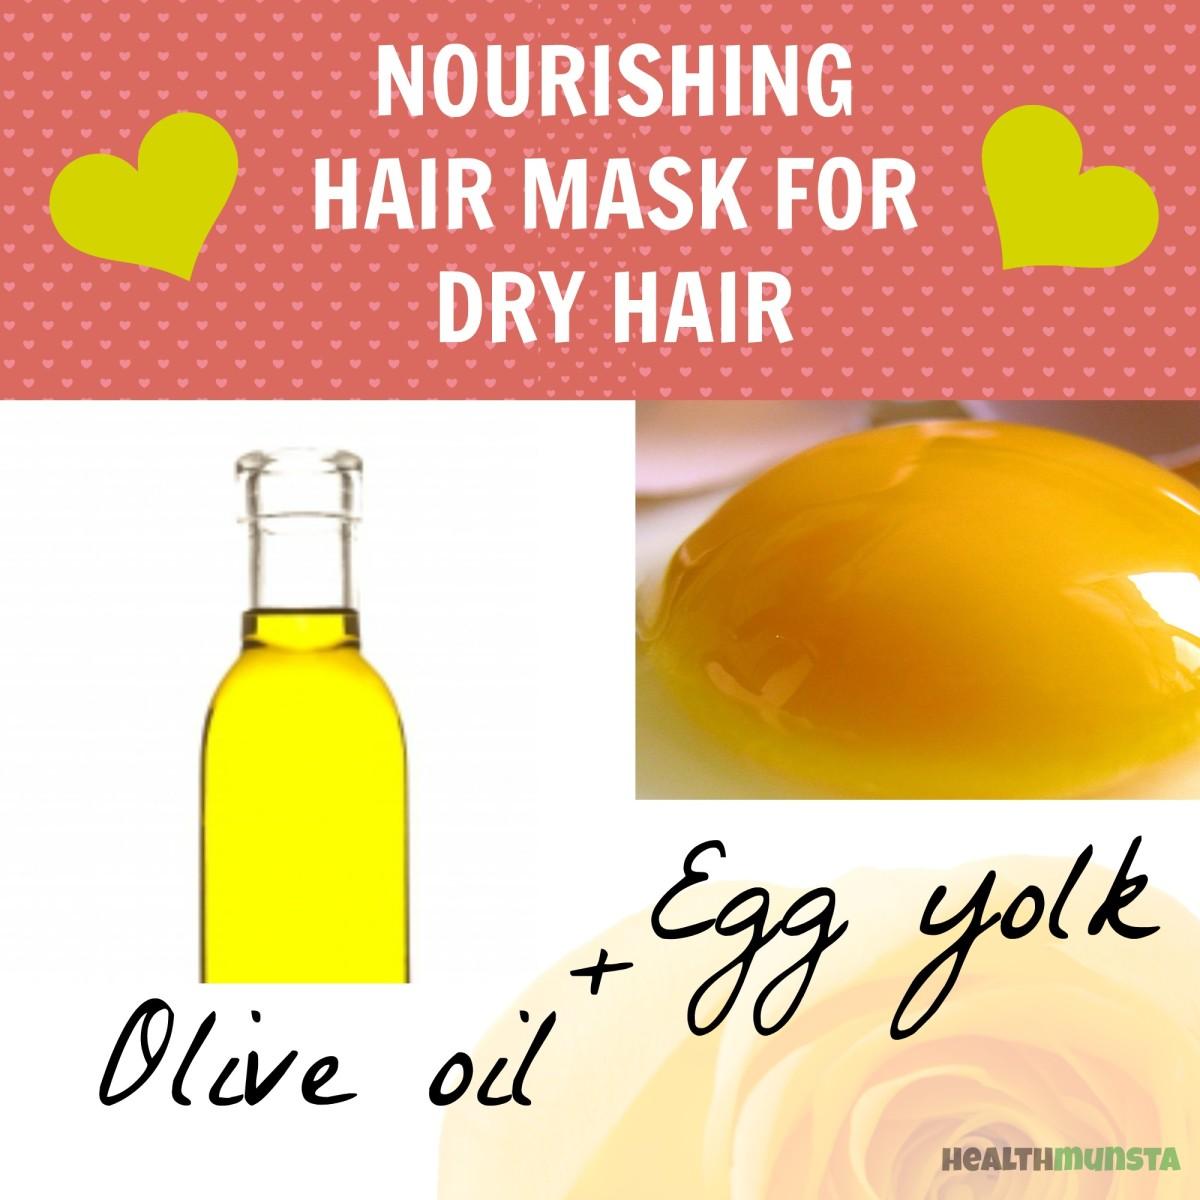 Diy Hair Care Best Hair Masks For Dry Hair